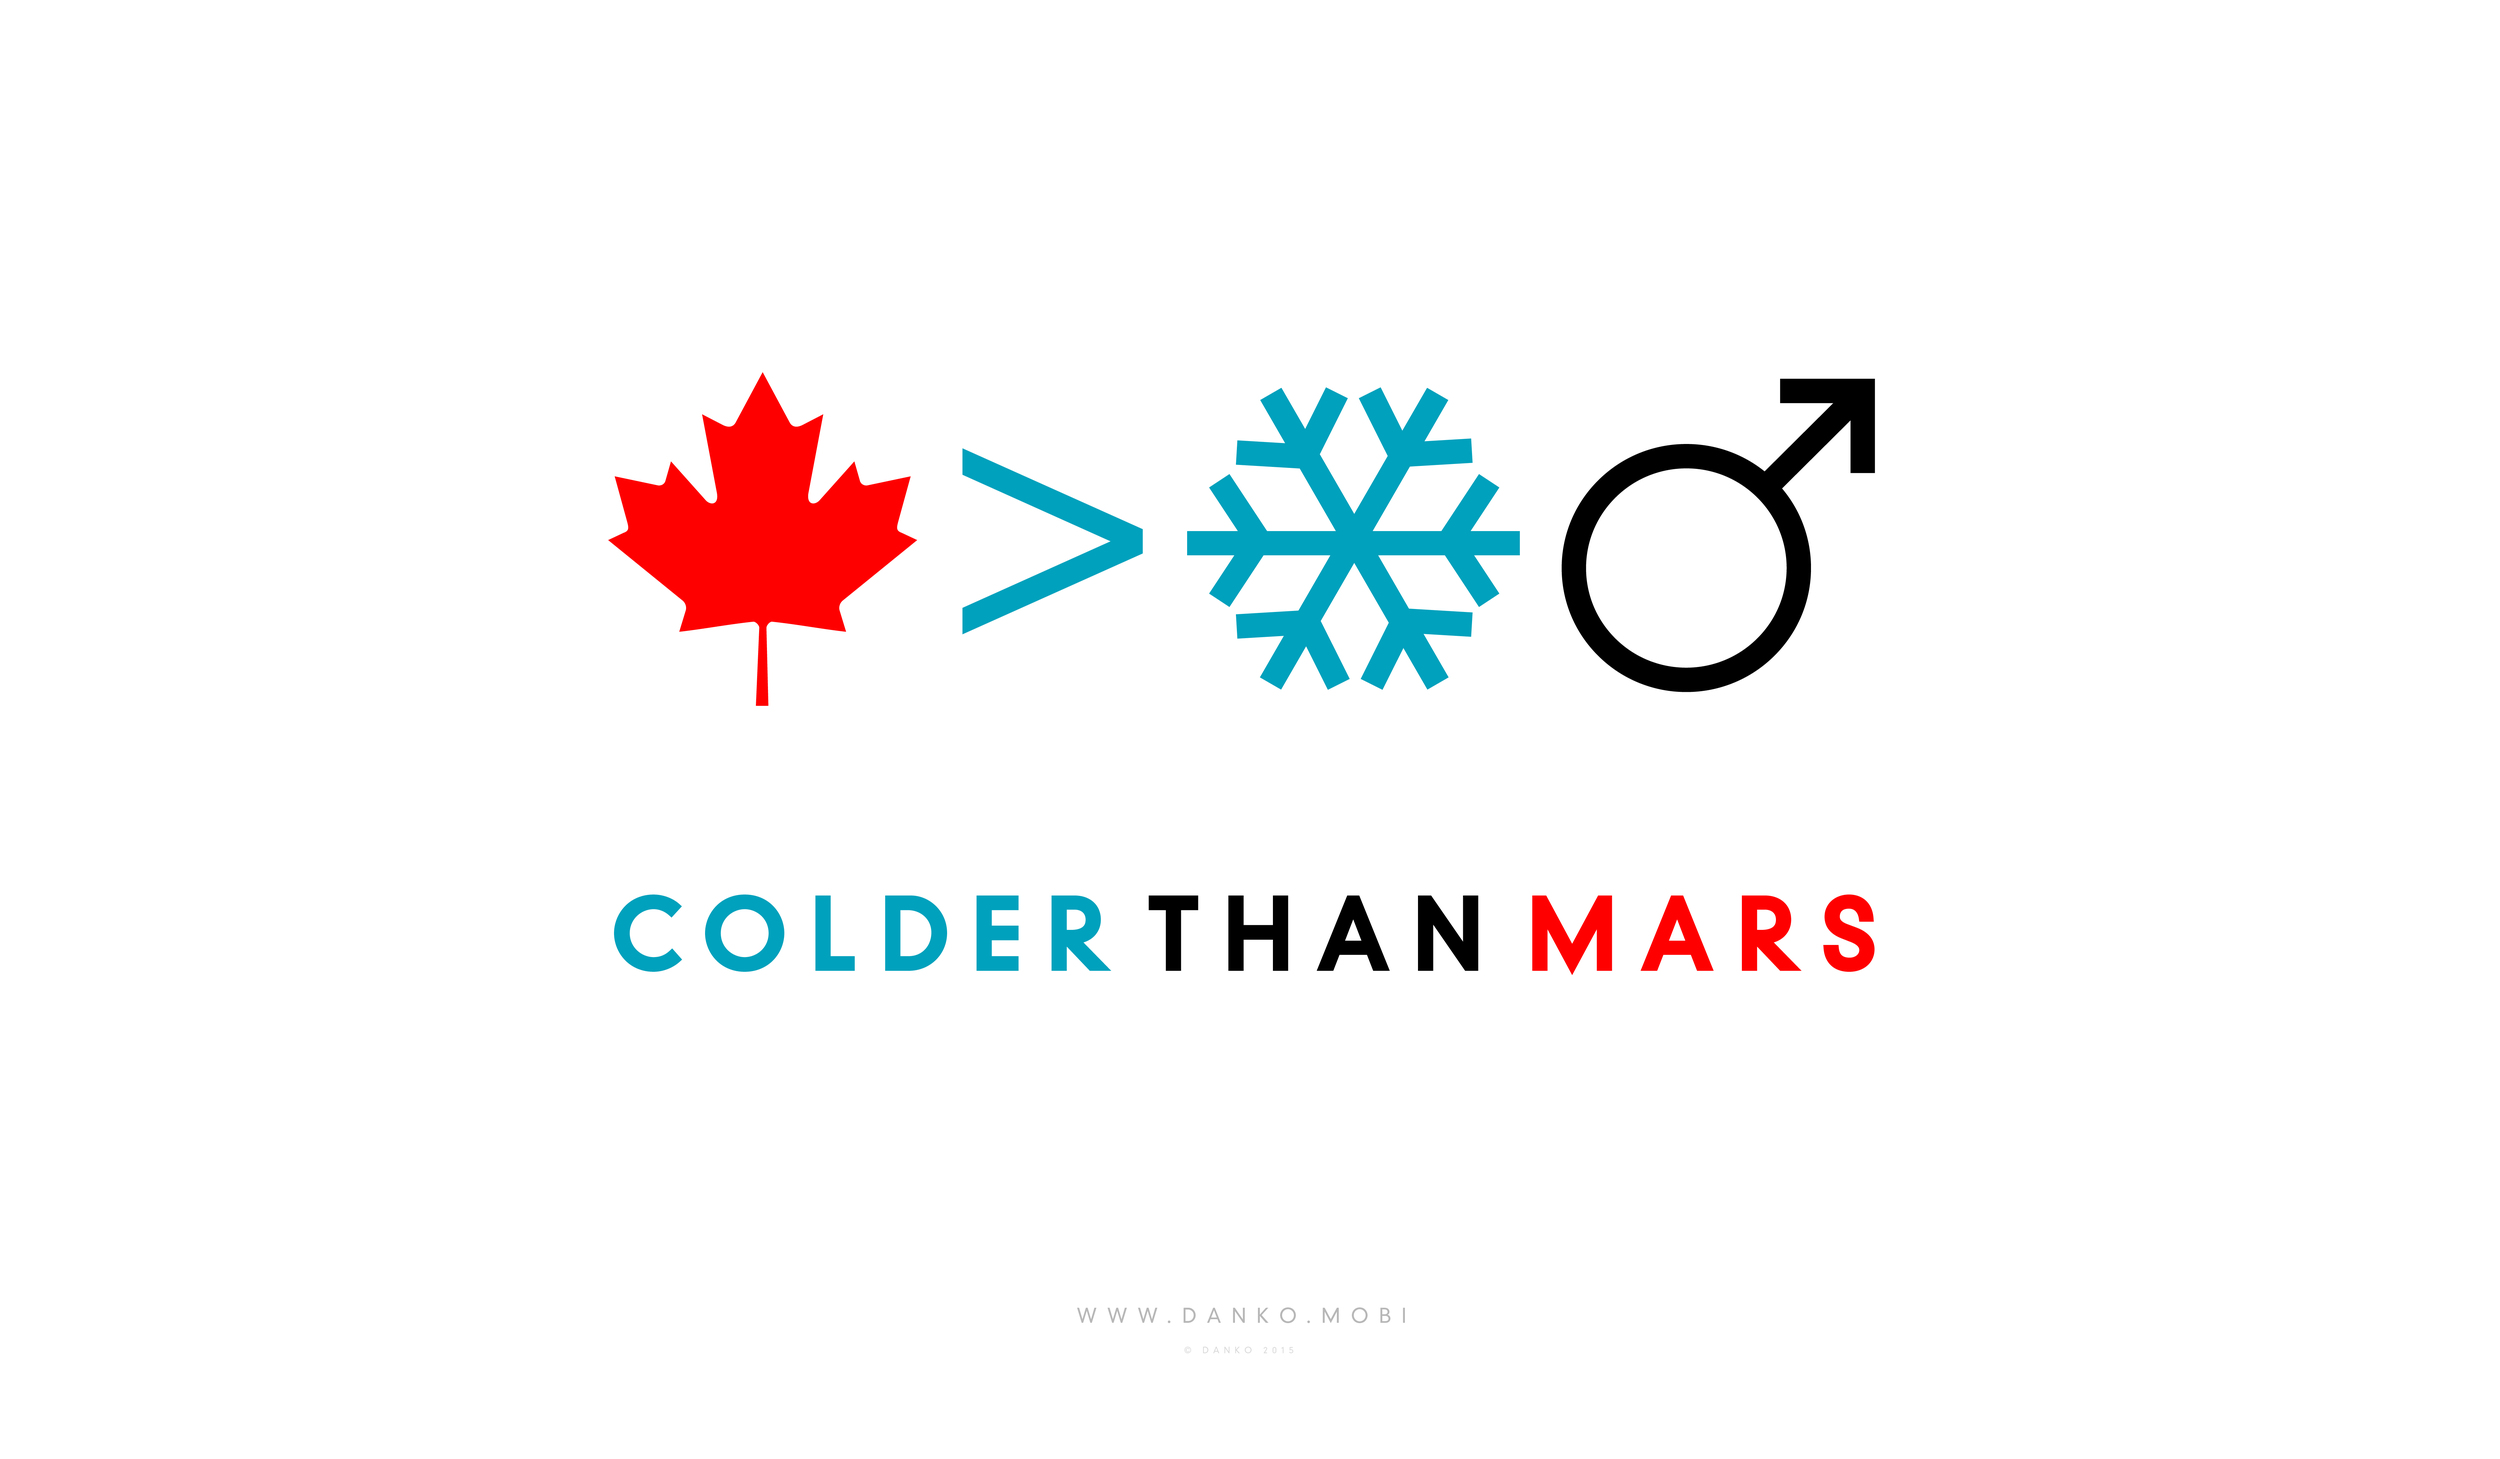 colderthanmars-05.jpg